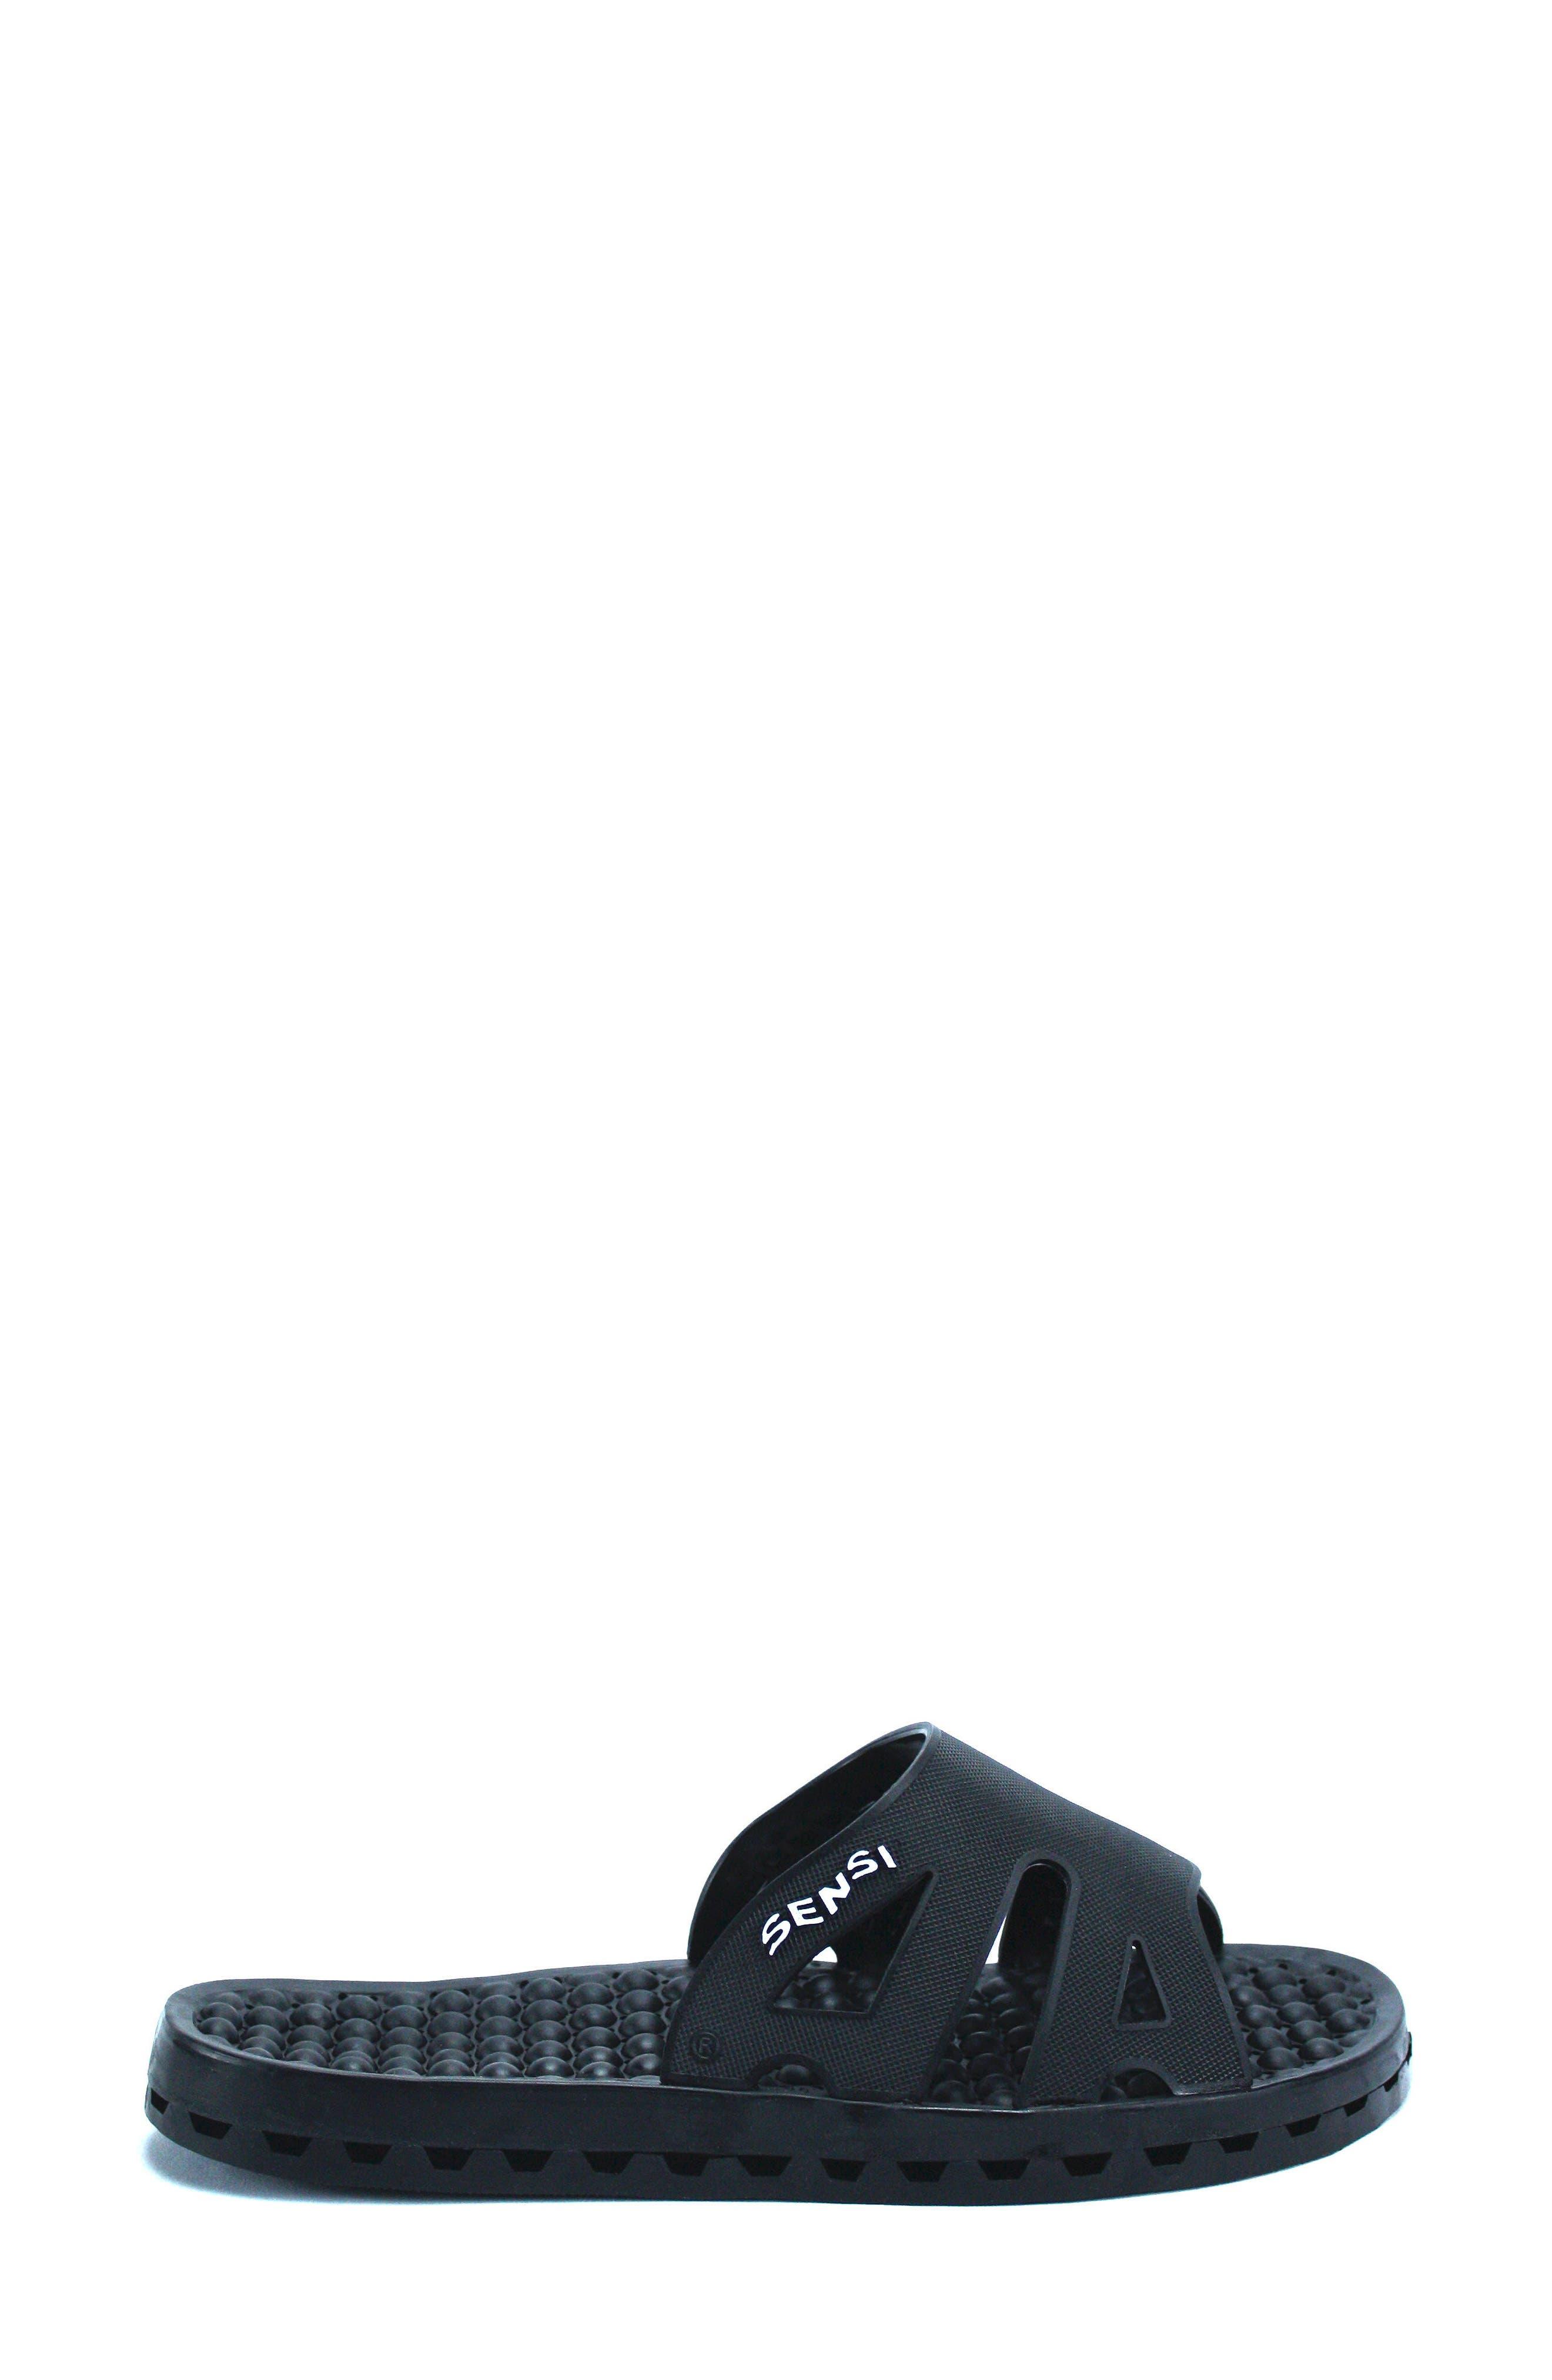 Regatta Ice Slide Sandal,                             Alternate thumbnail 3, color,                             SOLID BLACK